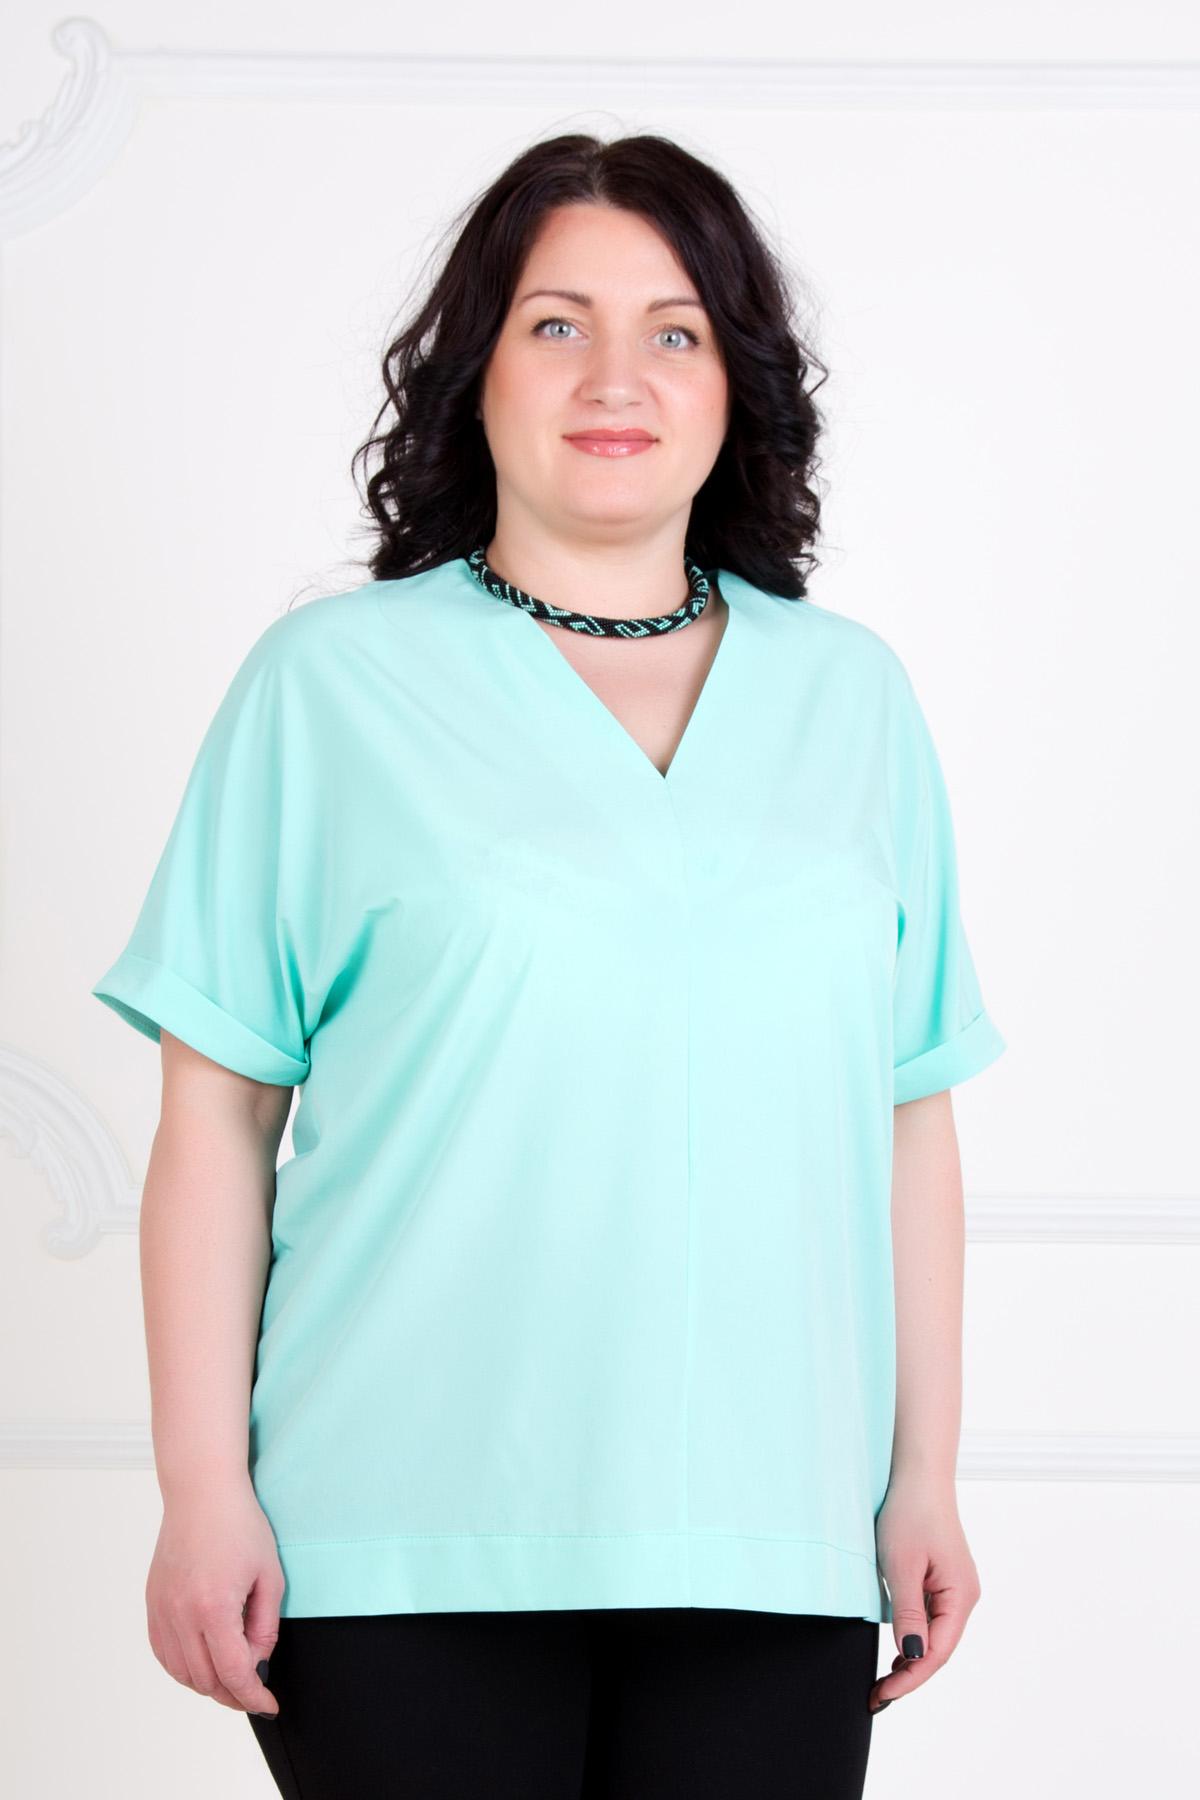 Жен. блуза Анна Ментол р. 58Блузы<br>Обхват груди: 116 см <br>Обхват талии: 97 см <br>Обхват бедер: 124 см <br>Длина по спинке: 69 см <br>Рост: 167 см<br><br>Тип: Жен. блуза<br>Размер: 58<br>Материал: Креп